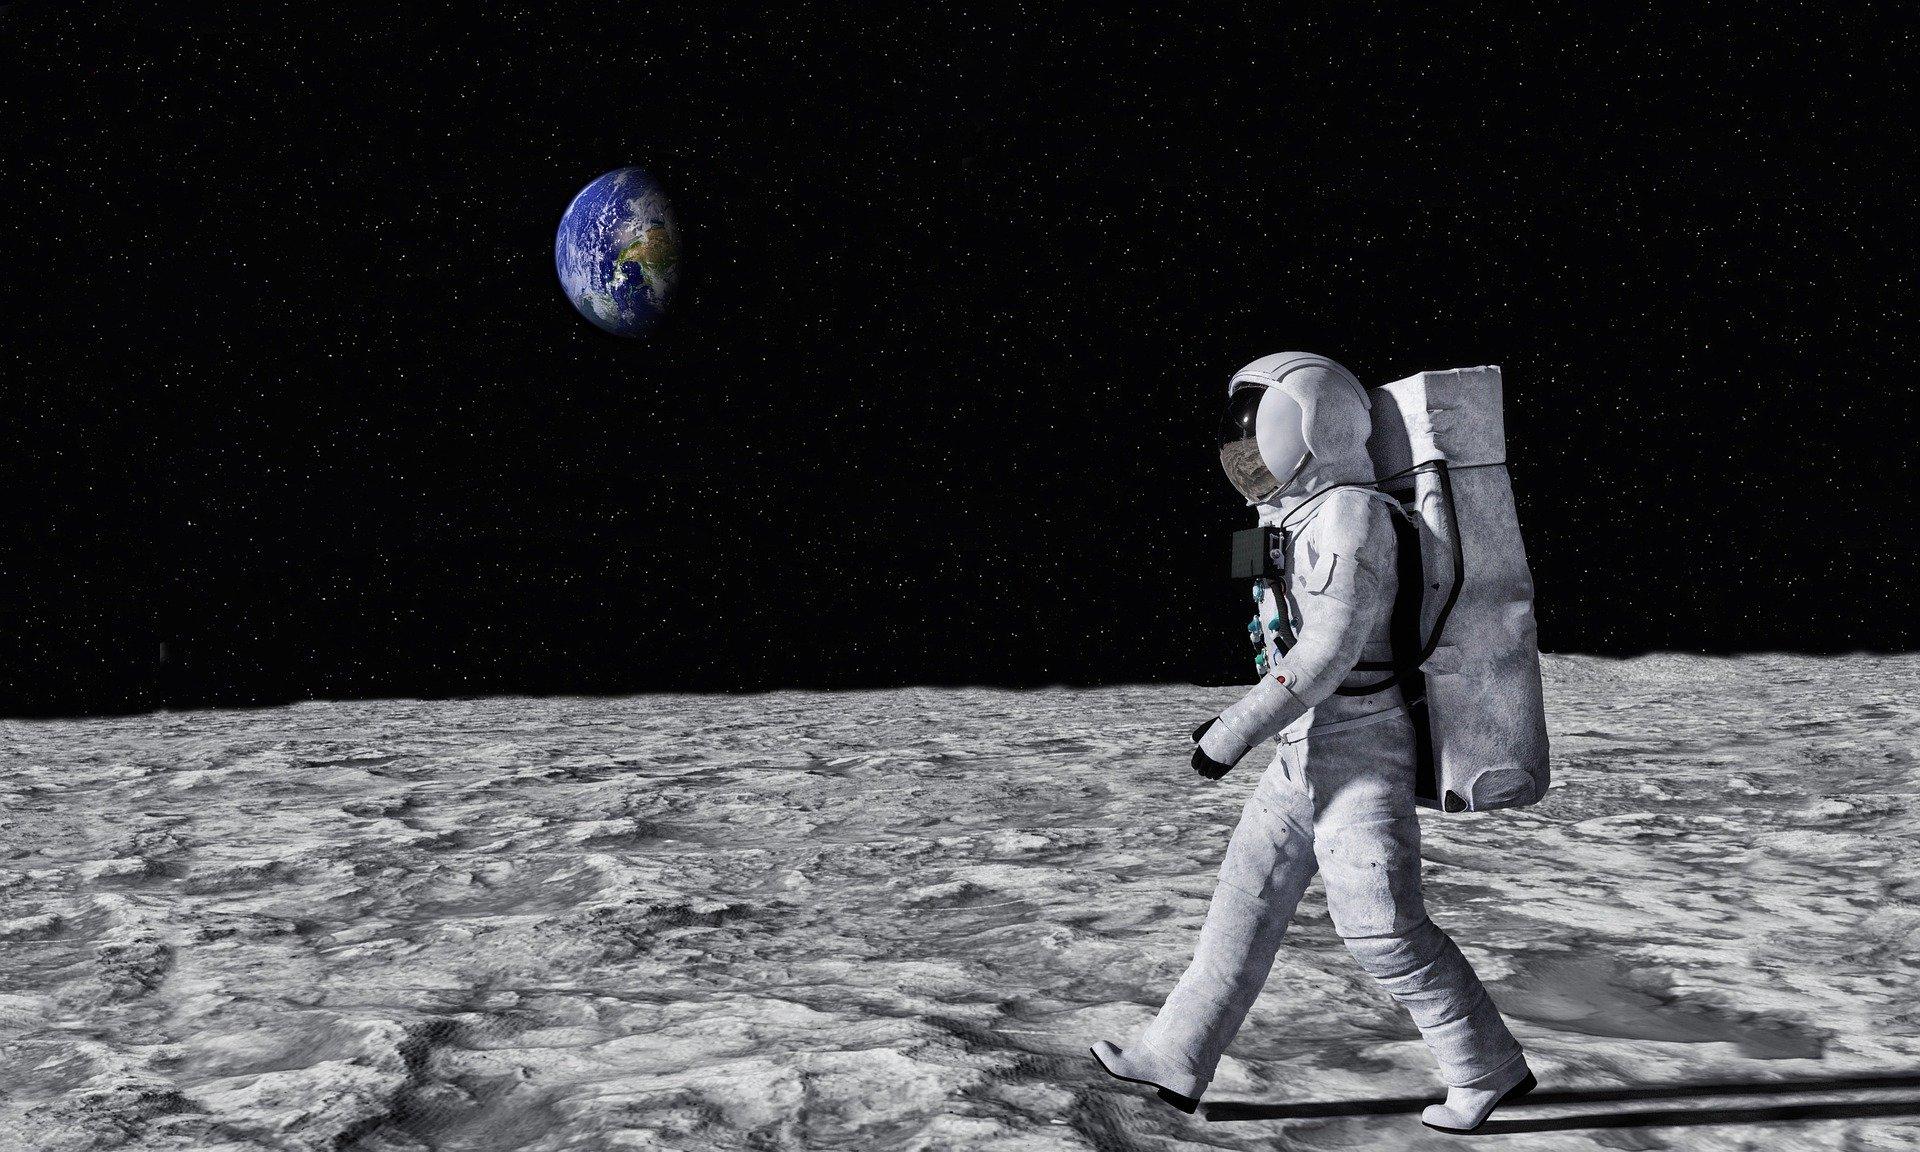 Commerce spatial : la NASA veut acheter des échantillons de sol